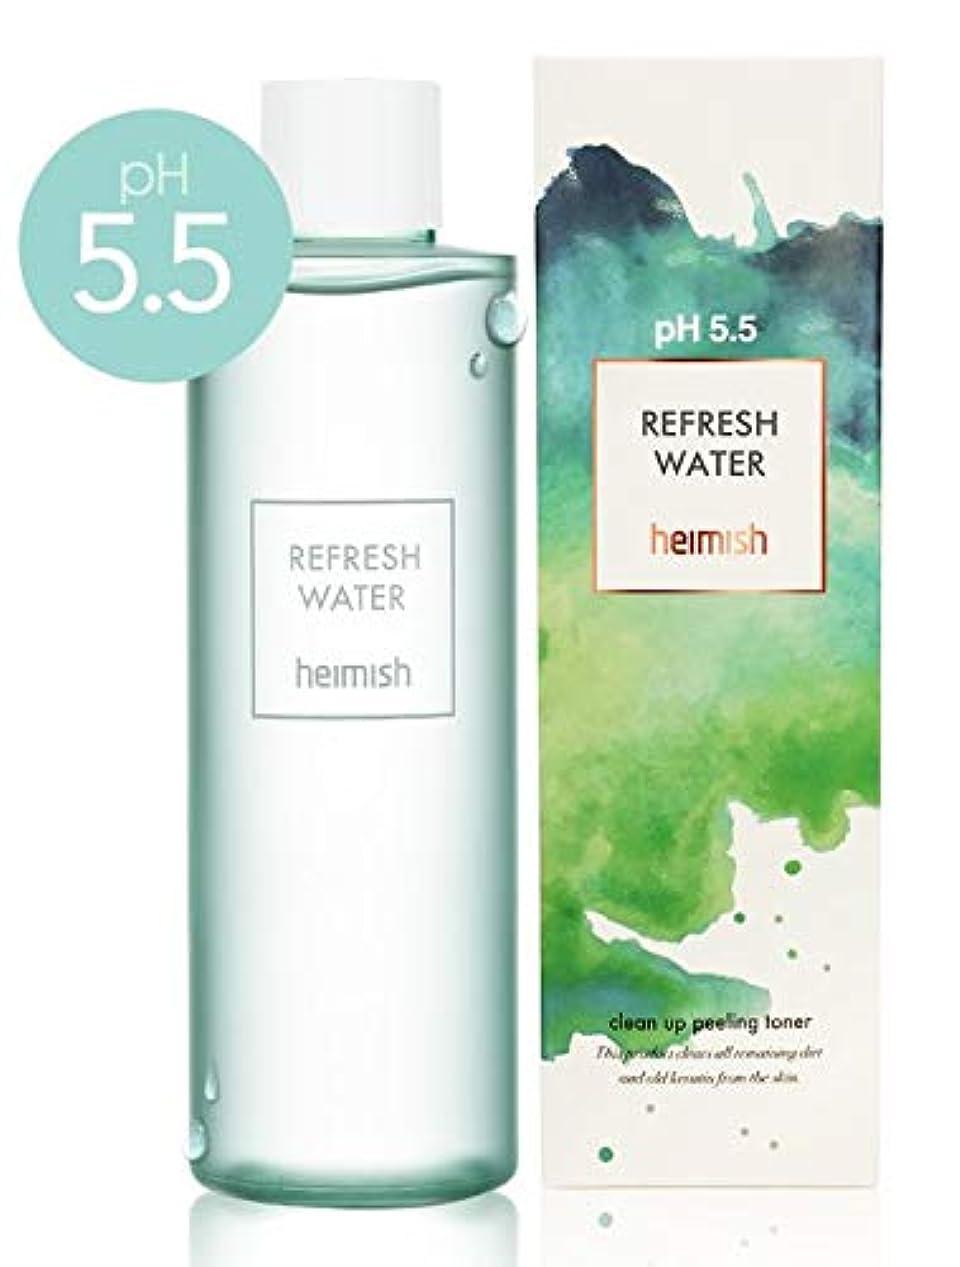 Heimish pH5.5 Refresh Water/ヘイミッシュリフレッシュ ウォーター 250ml [並行輸入品]